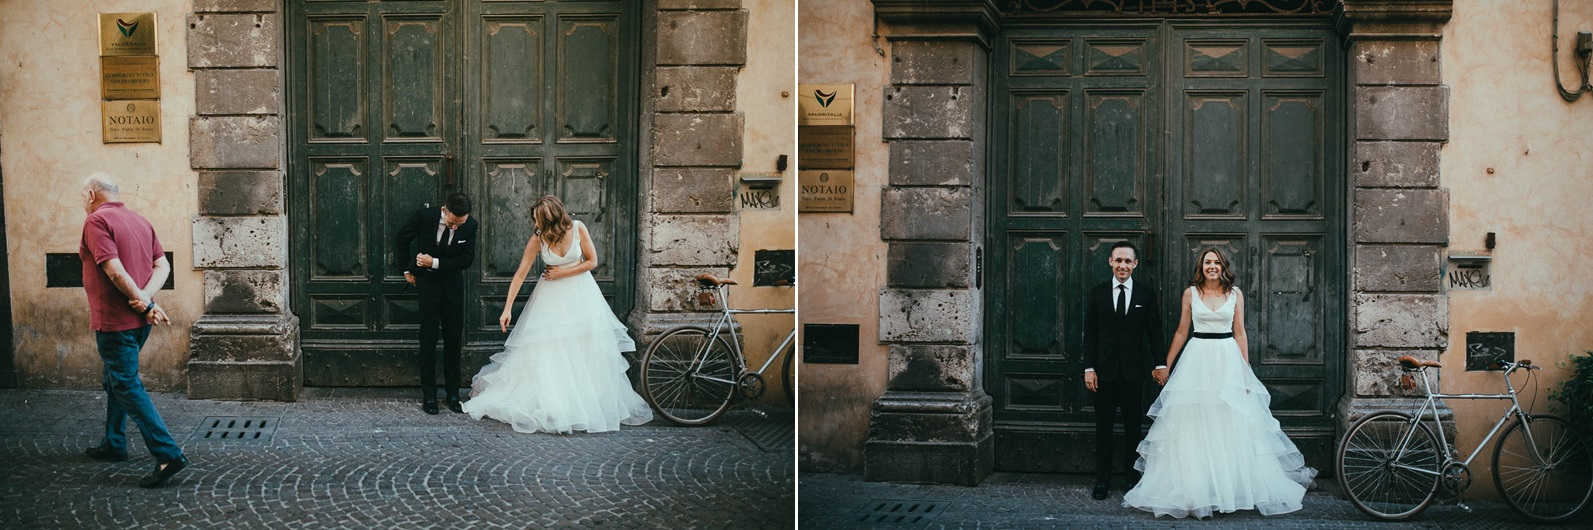 stylish-elopement-photographer-italy (122).jpg